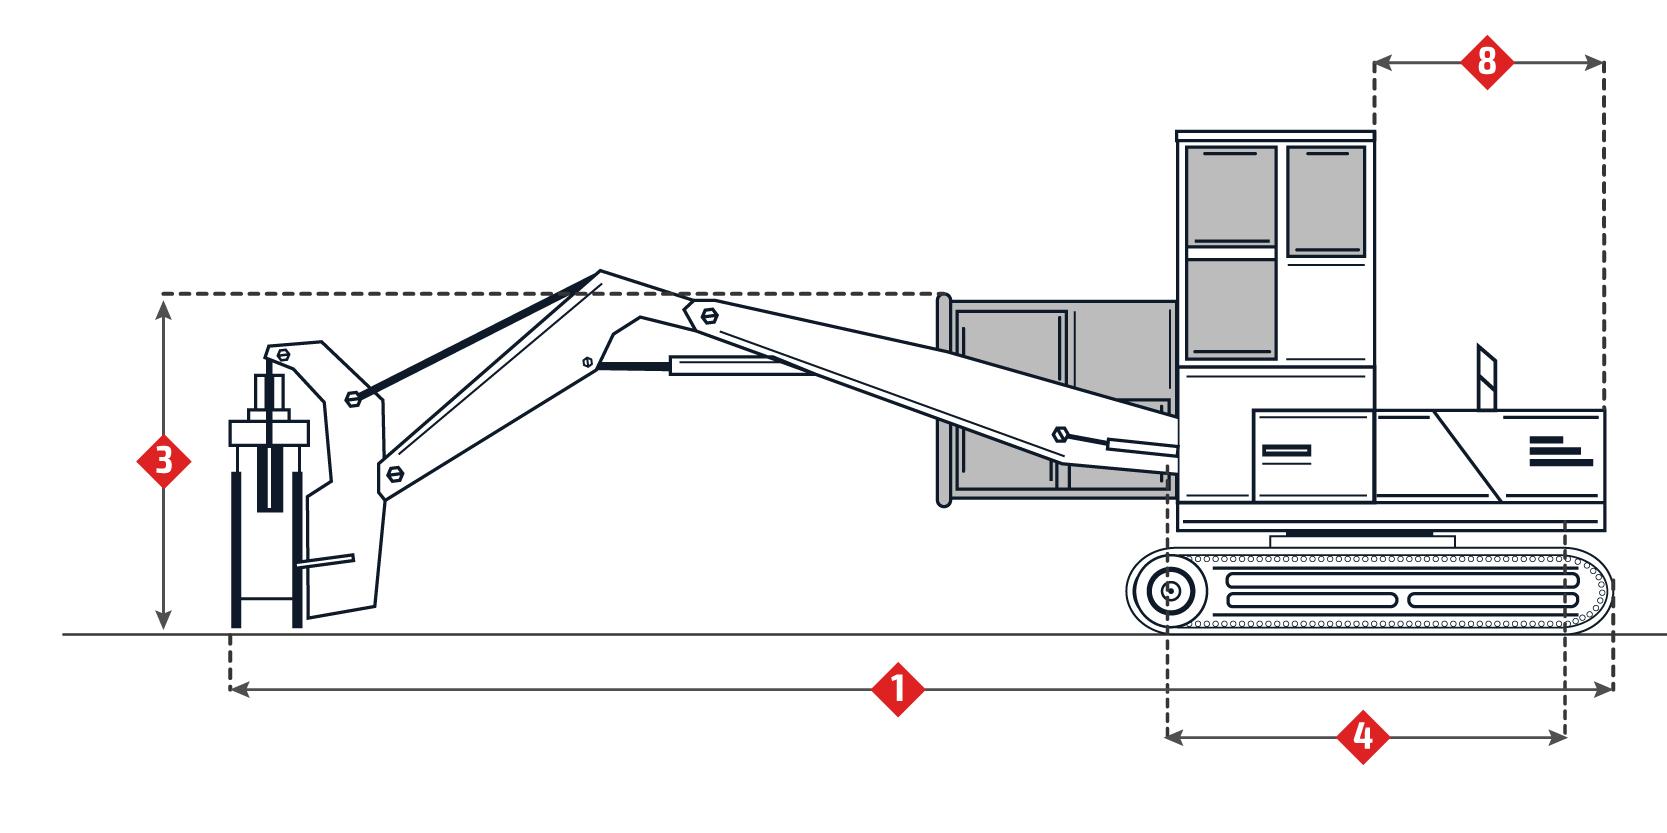 John Deere 437c Specifications Timber Loader